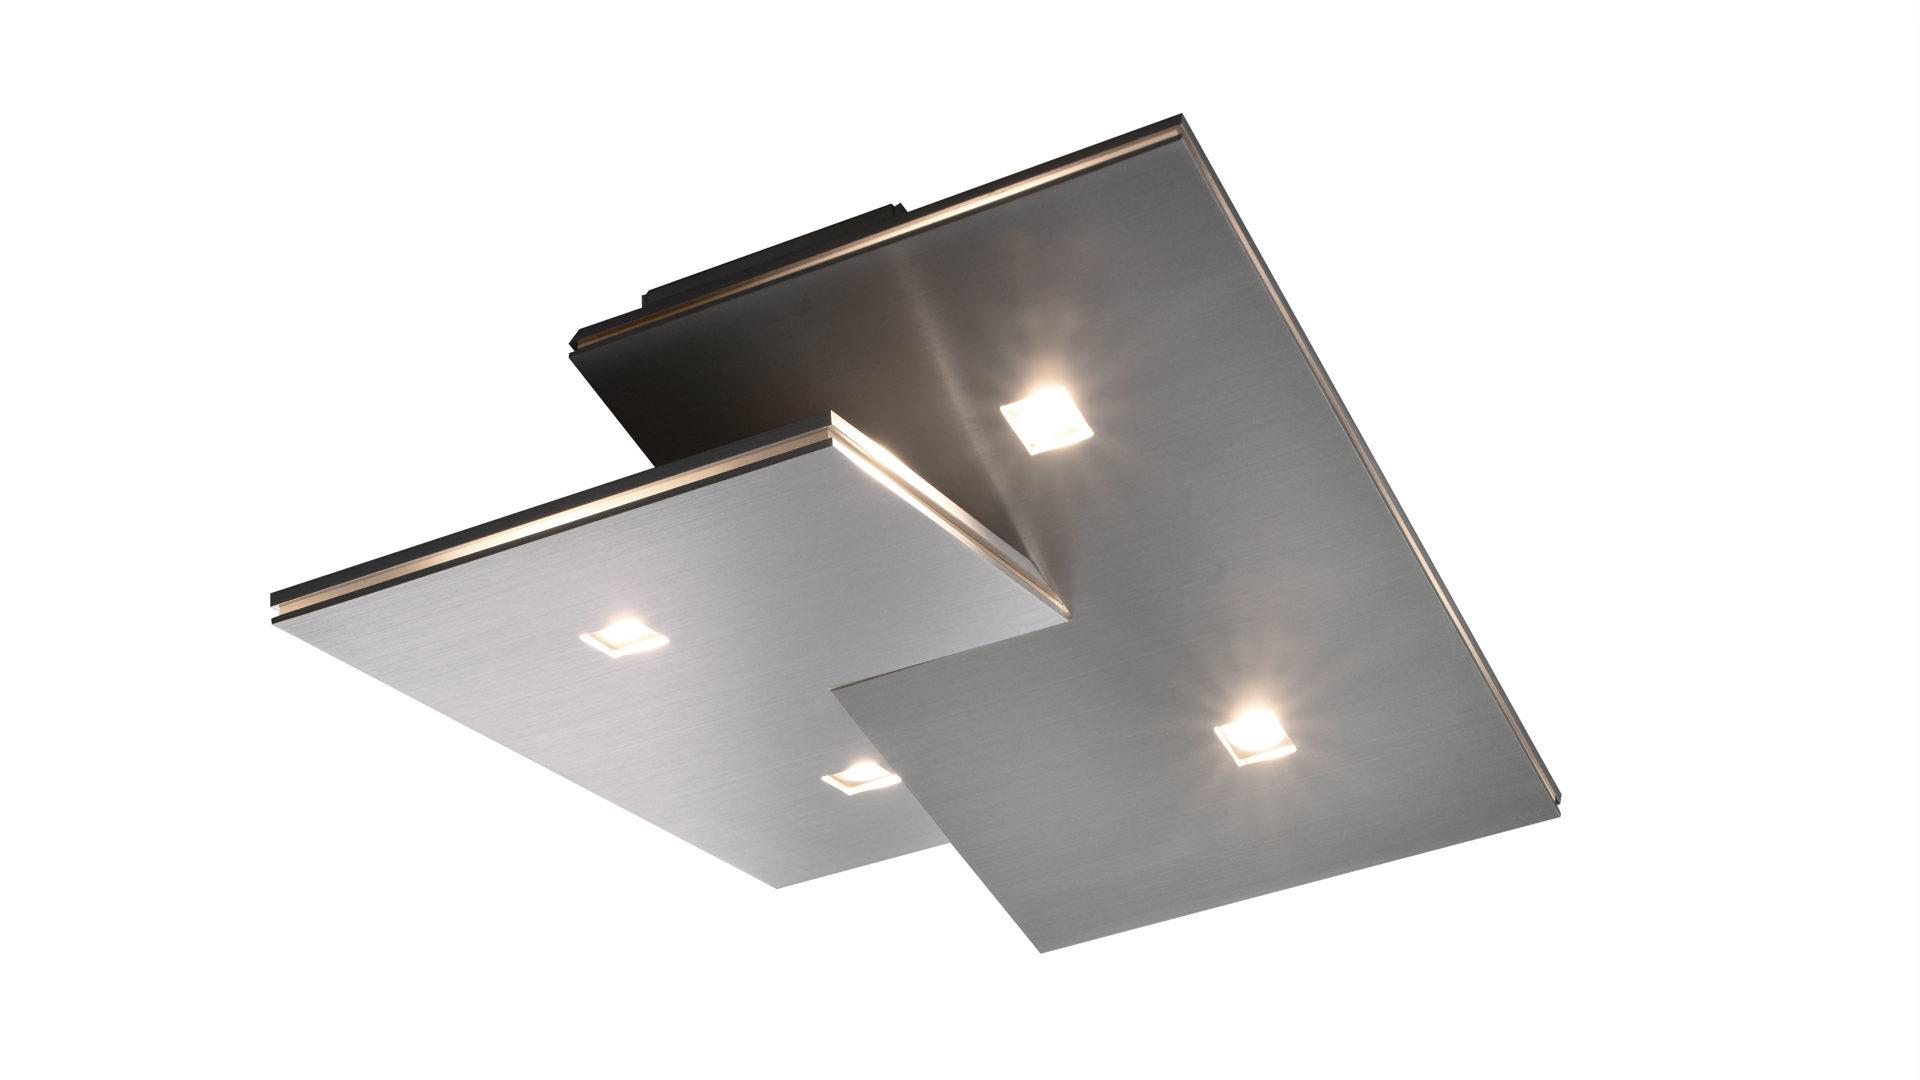 Deckenlampe Küche Modern | afdecker.com